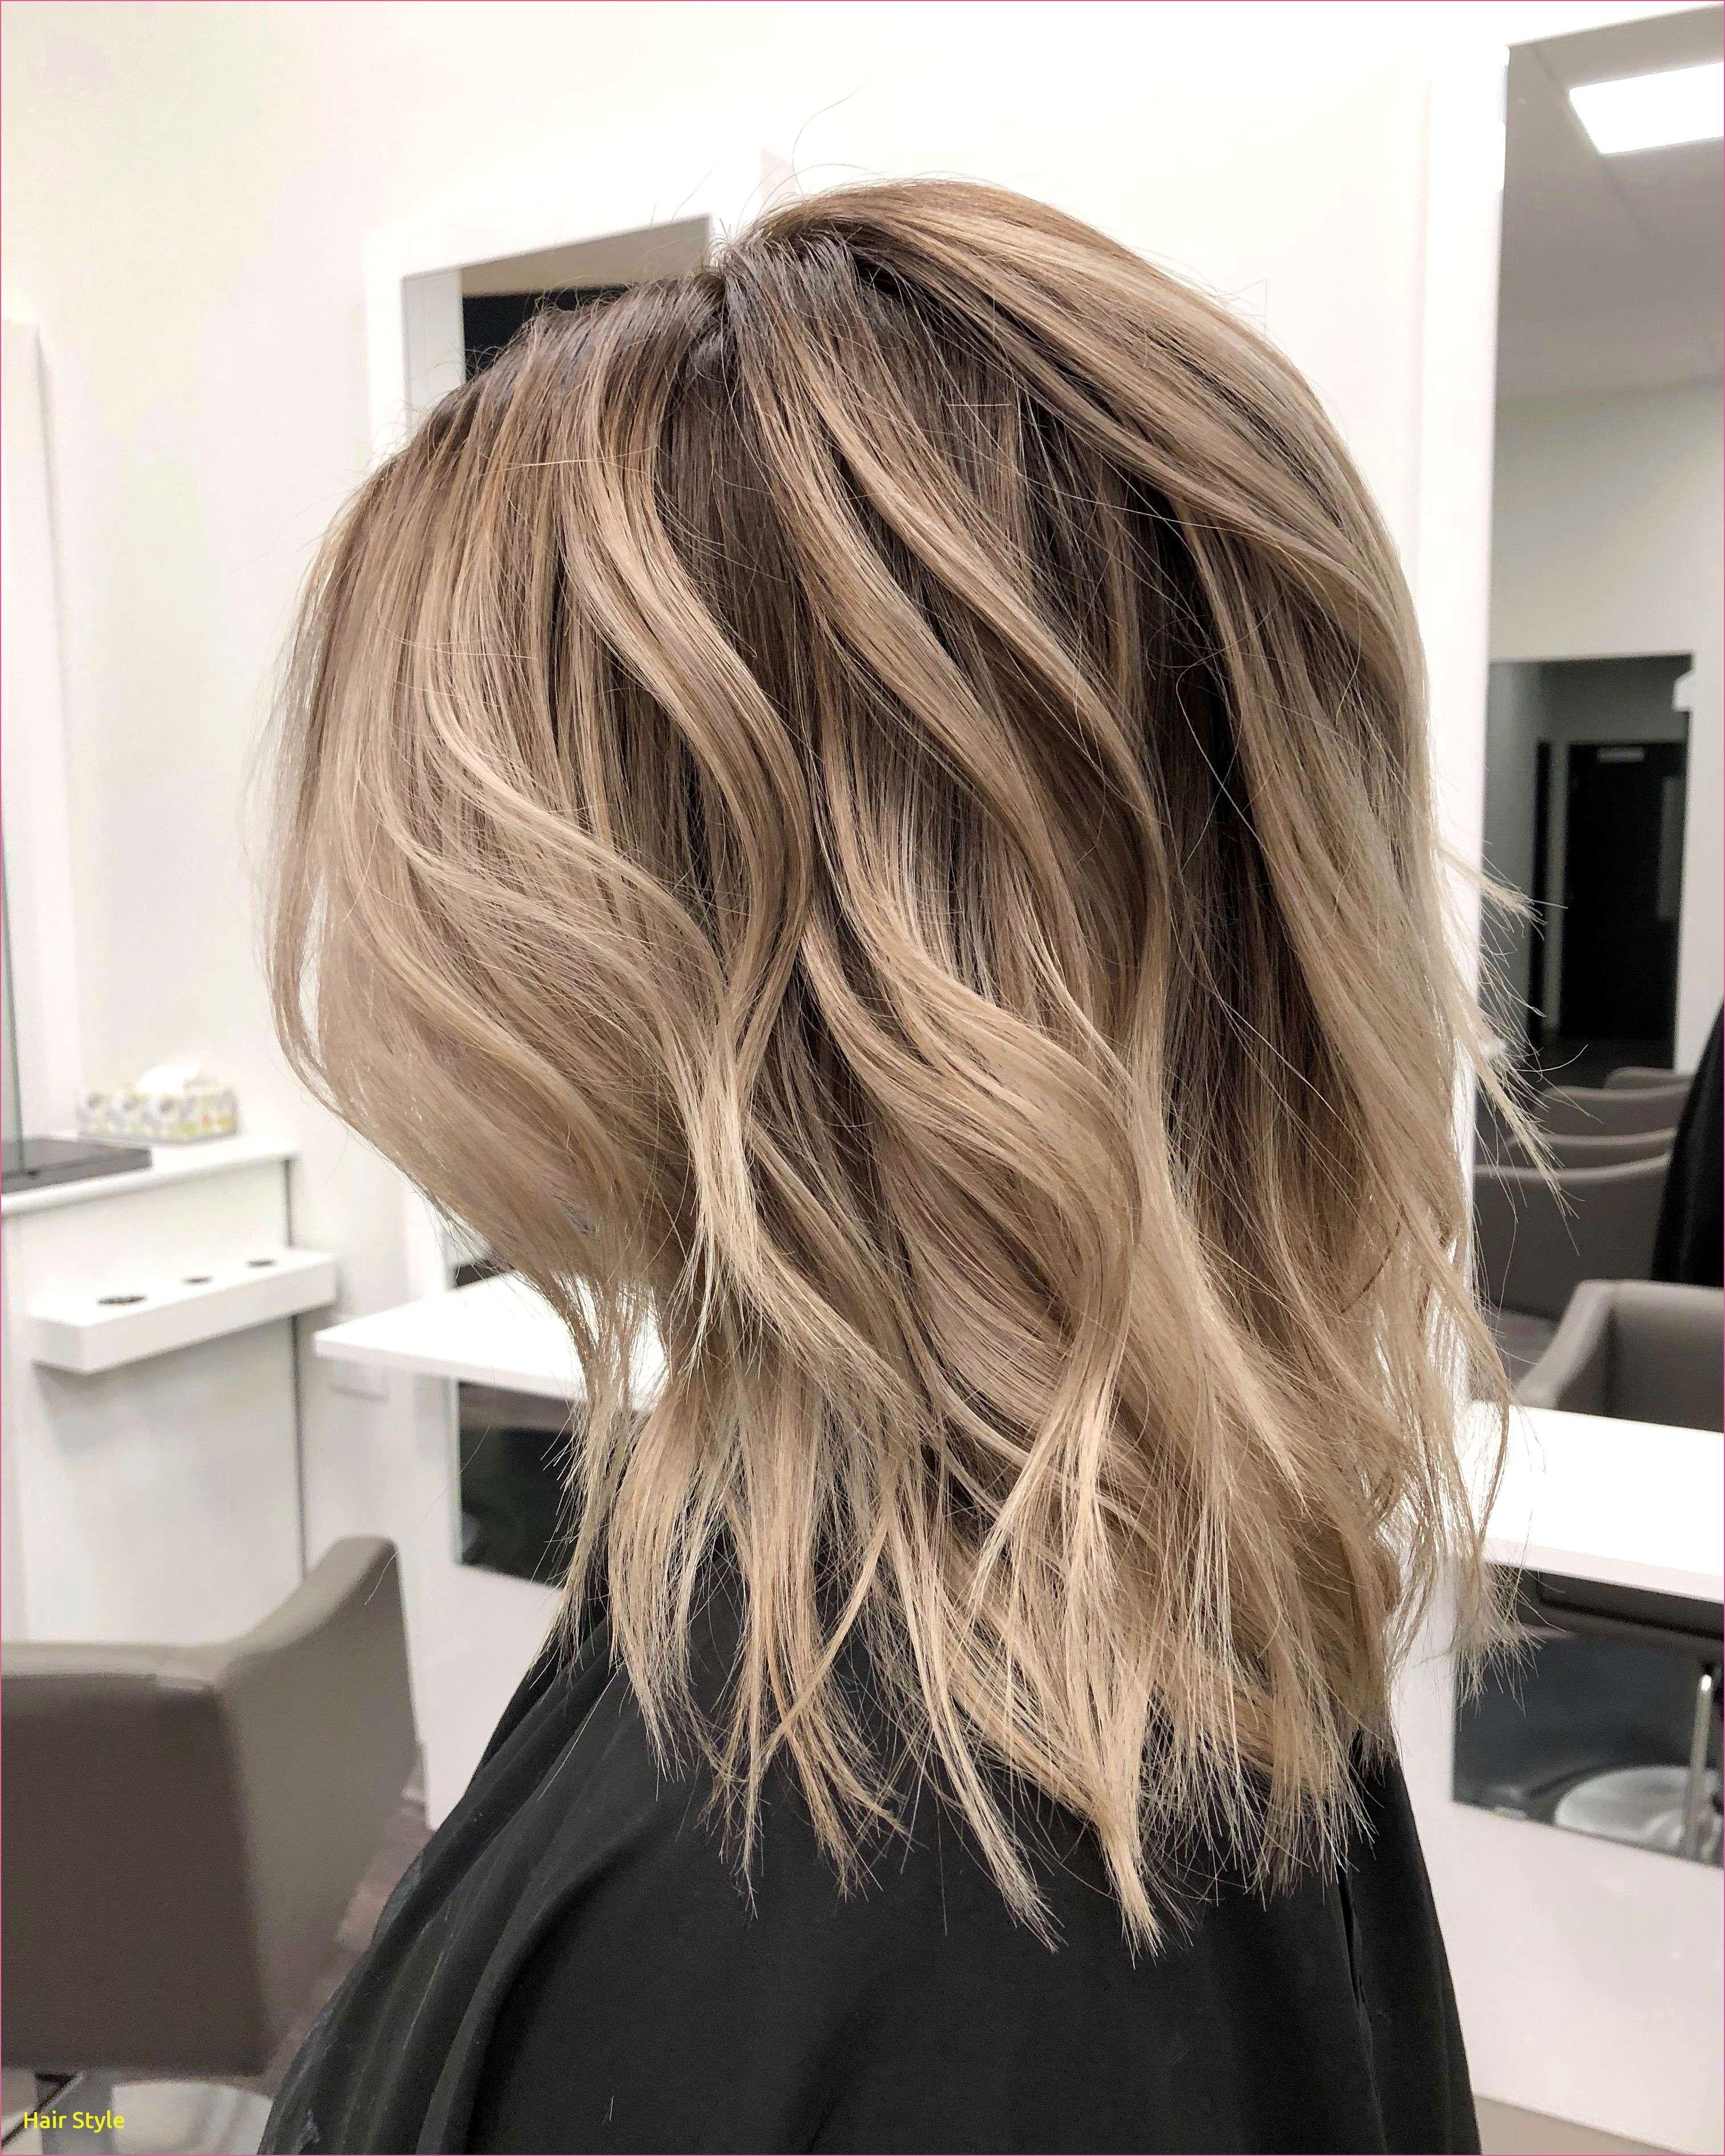 Frisur Mittellang 2019 Haircuts For Wavy Hair Brunette Hair Color